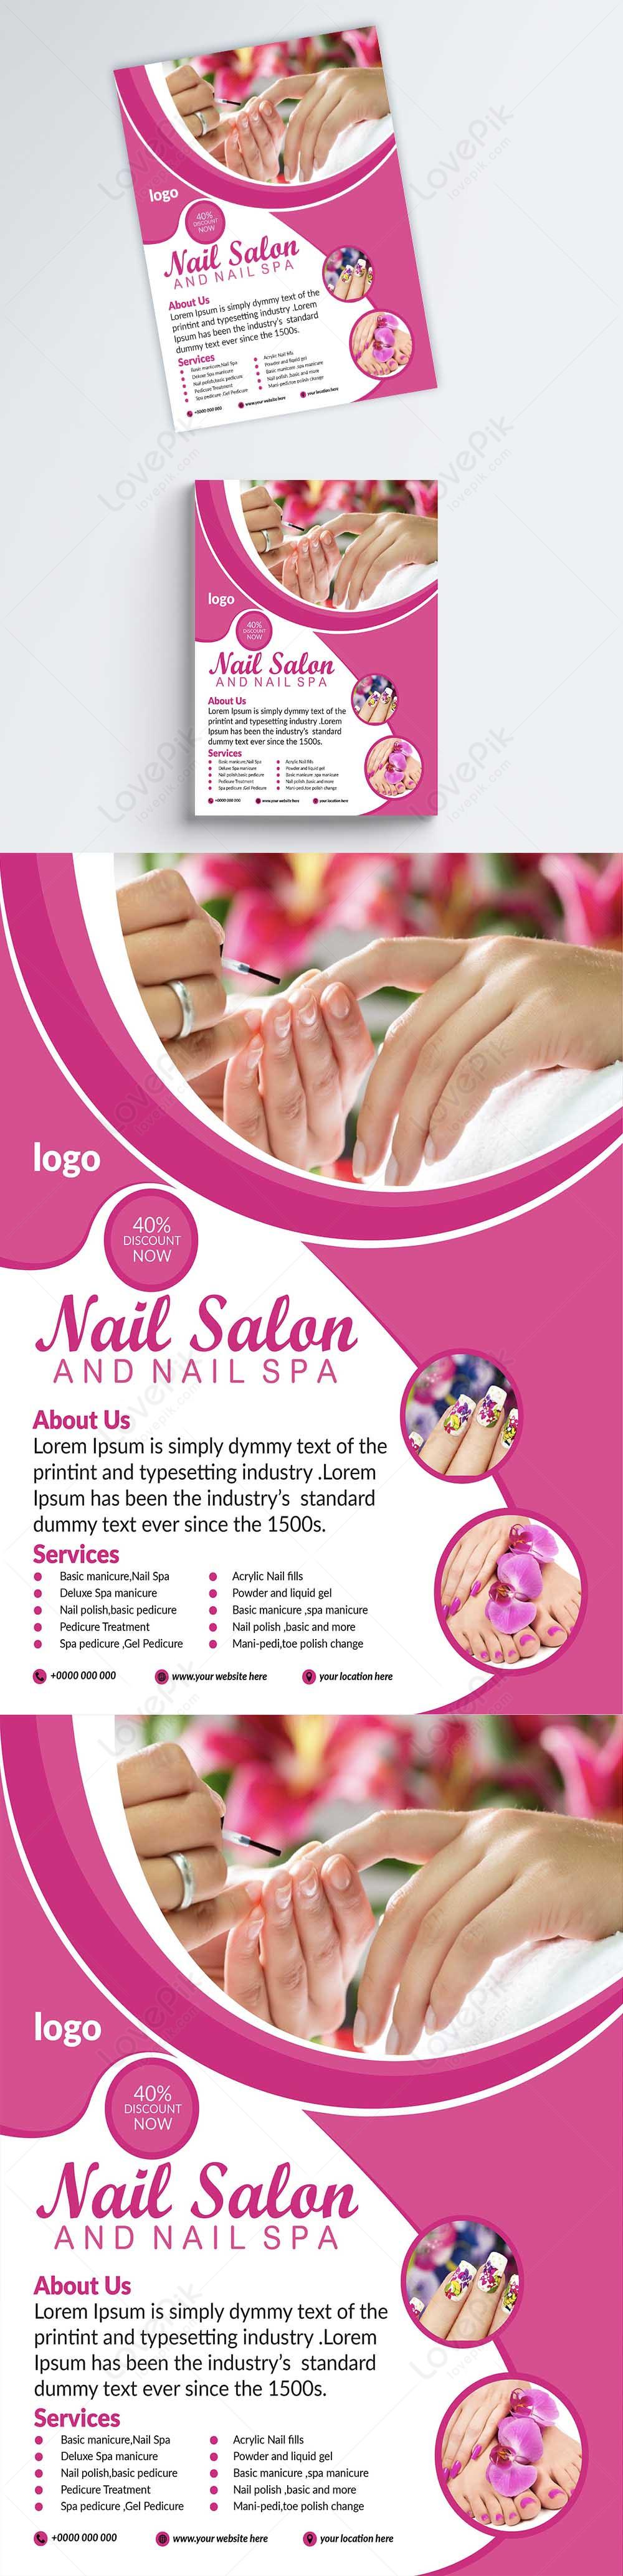 nails salon promotion flyer template